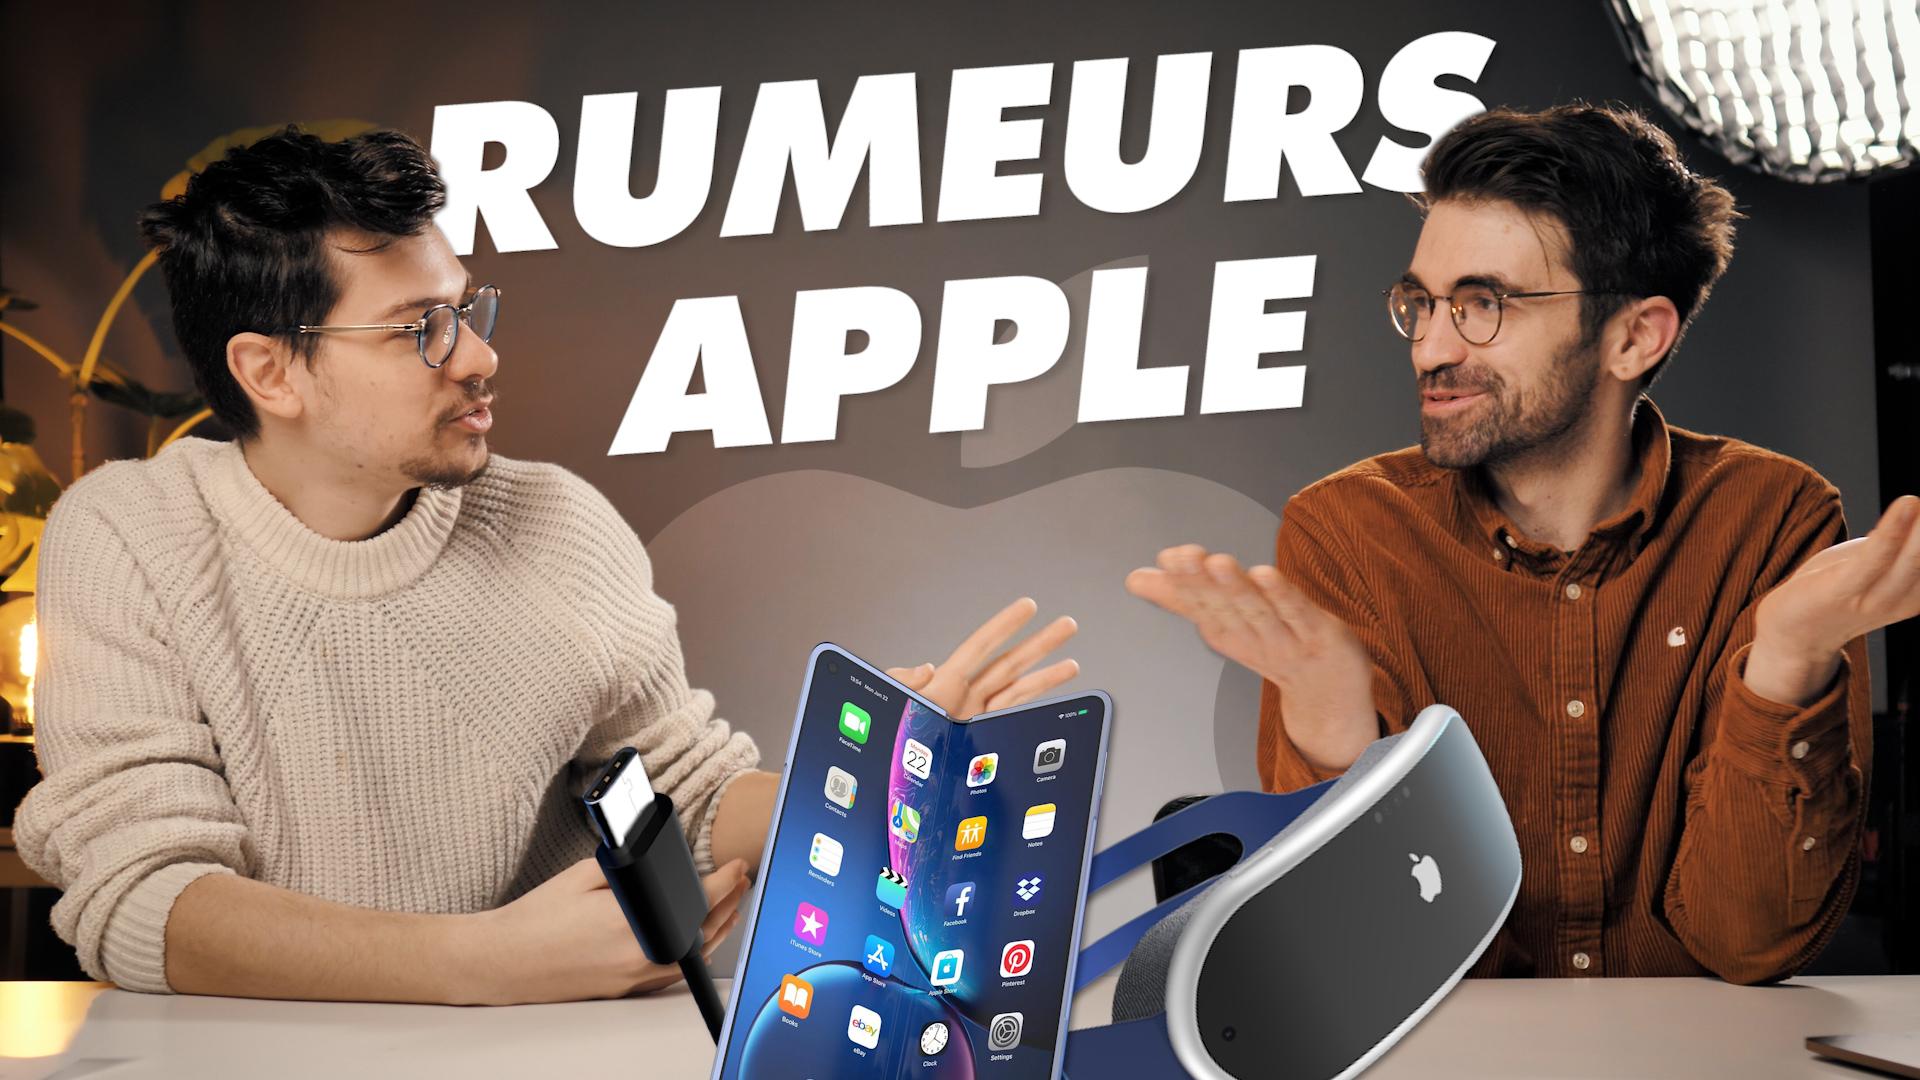 Le futur d'Apple en 5 RUMEURS (feat. Léo Duff)